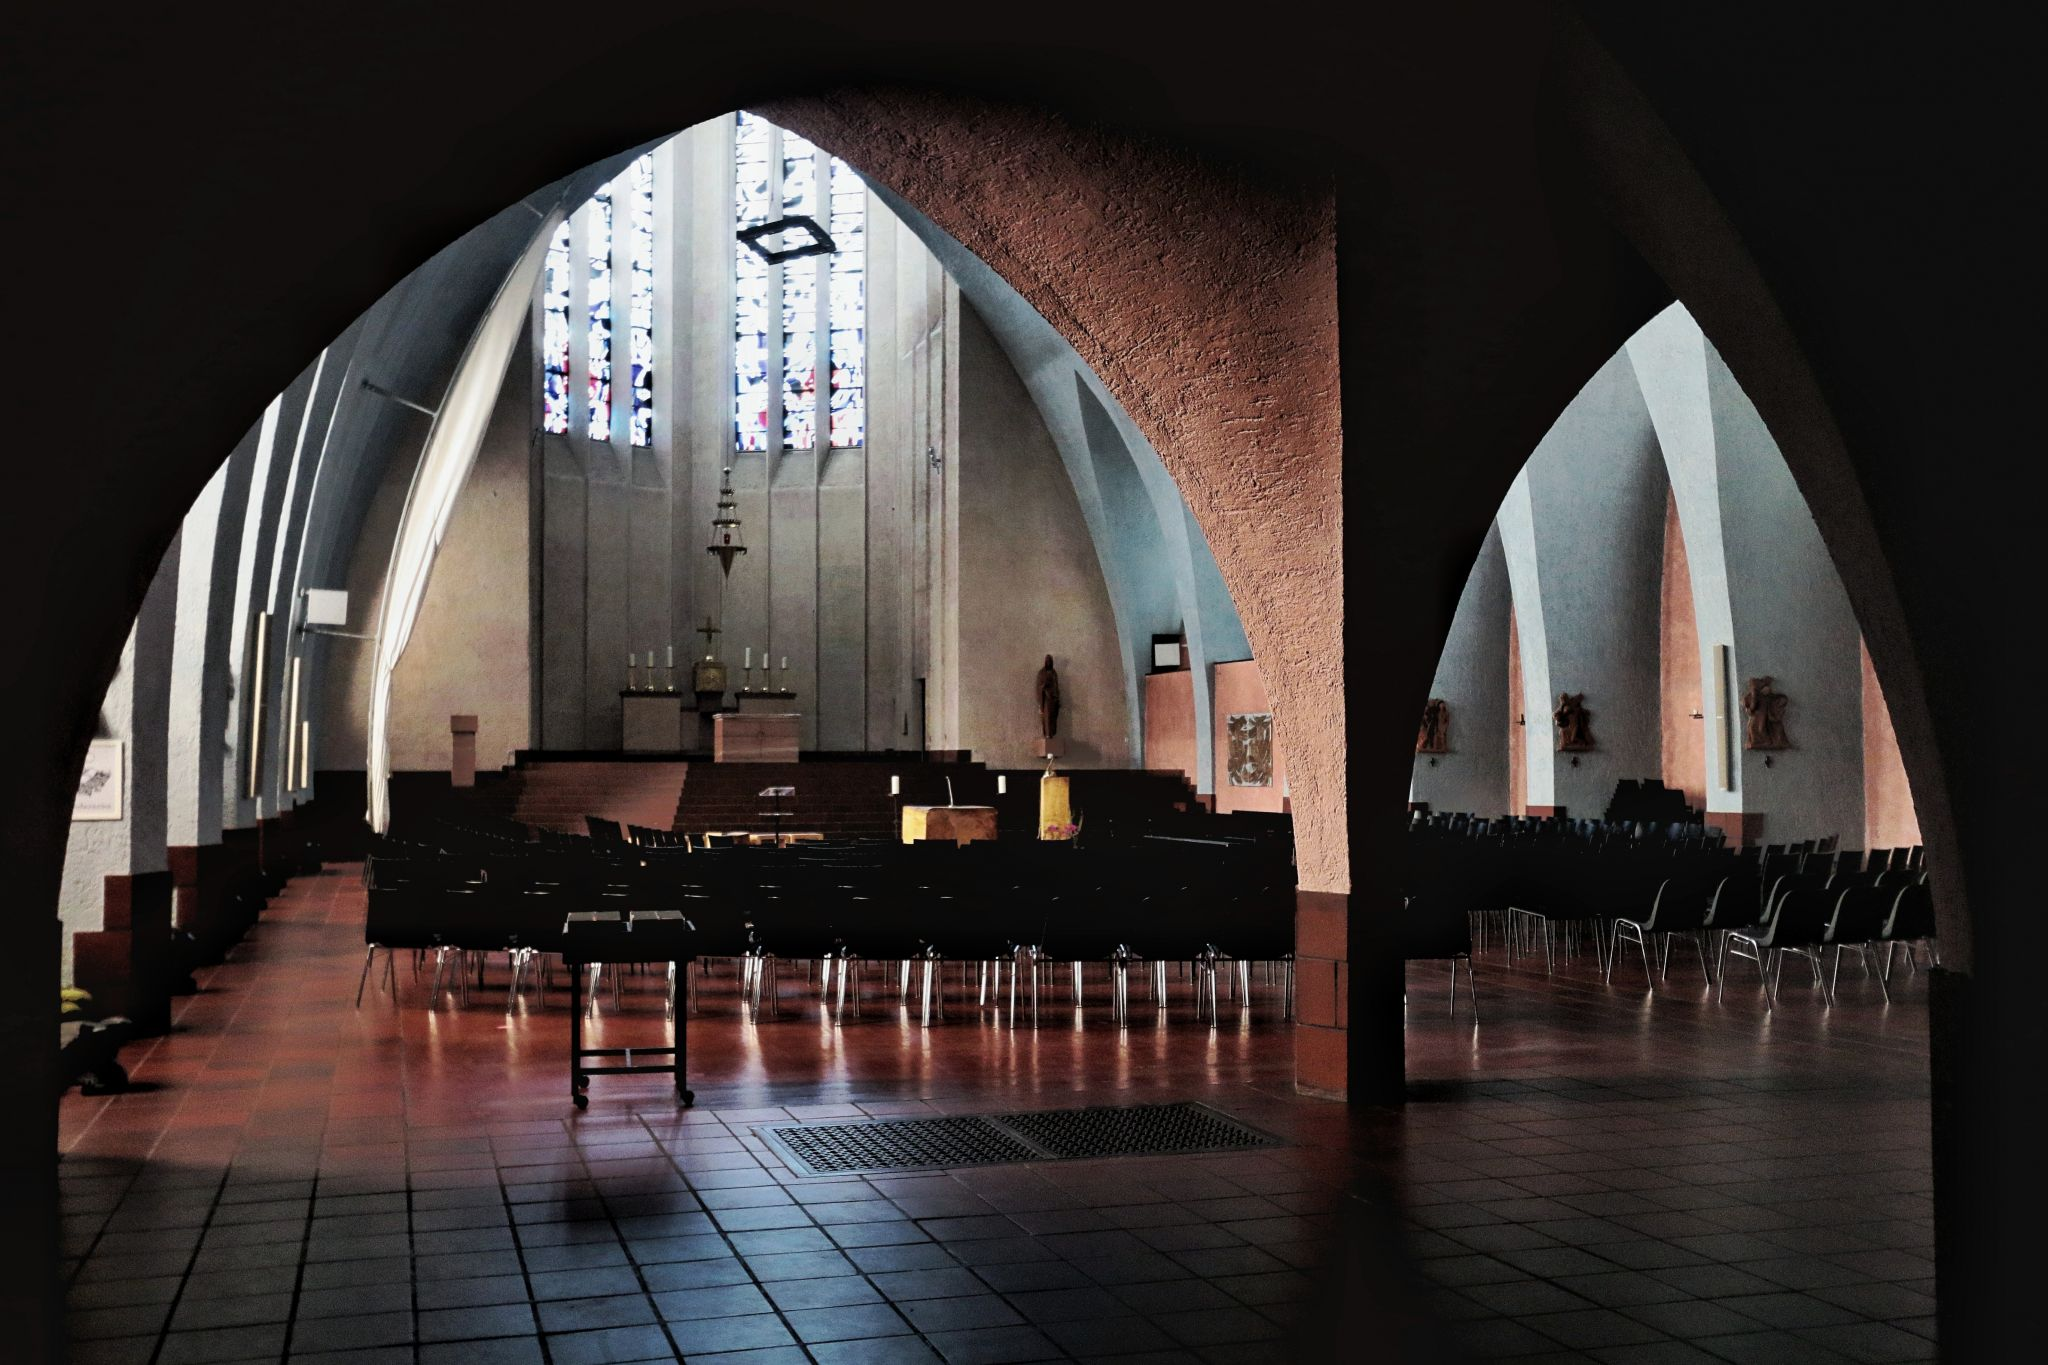 St. Bonifatiuskirche, St. Bonifatius church, Germany